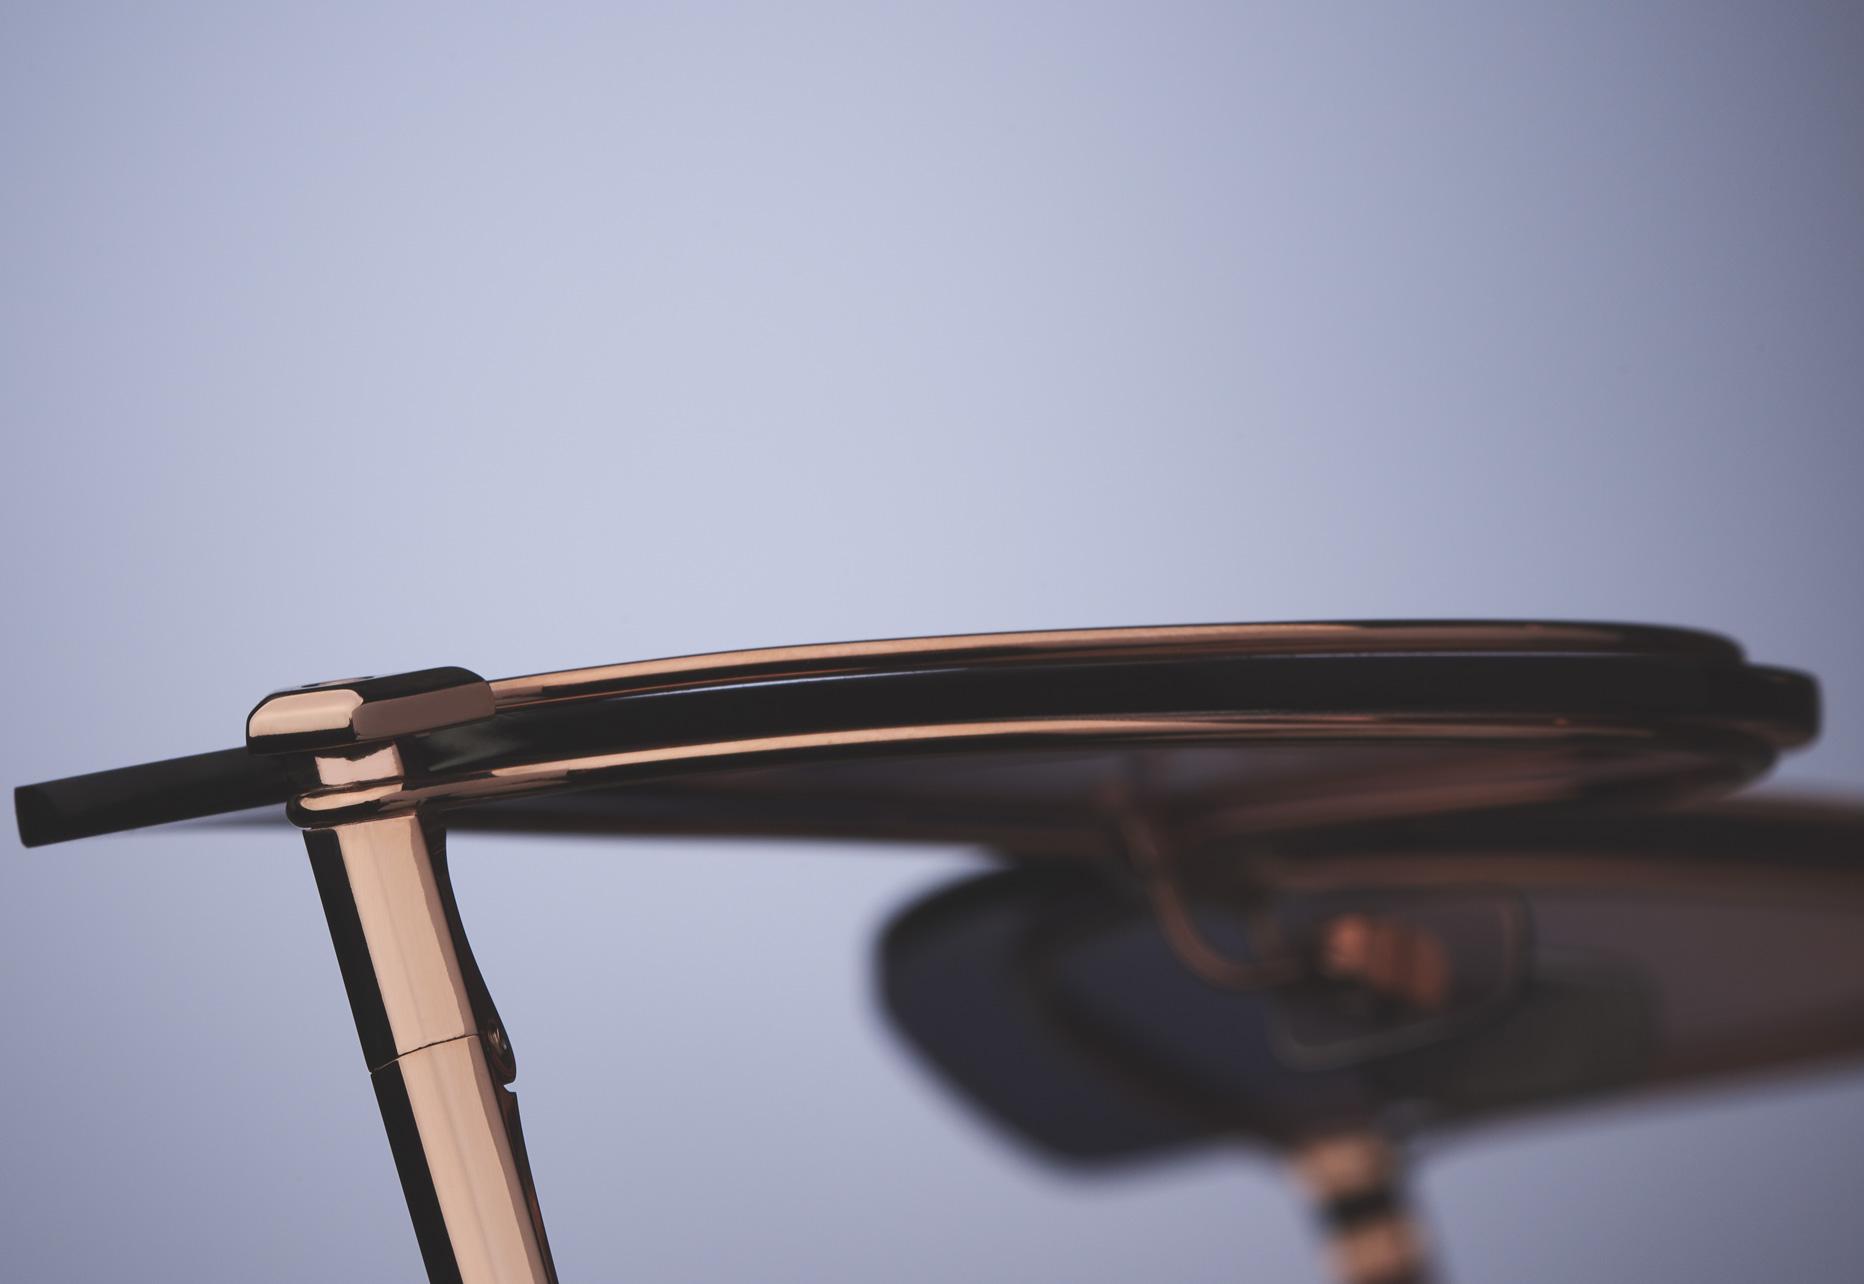 DITA NIGHTBIRD - ONE UNIQUE TITANIUM DOUBLE FRAME CONSTRUCTION TO HOLD LENSES